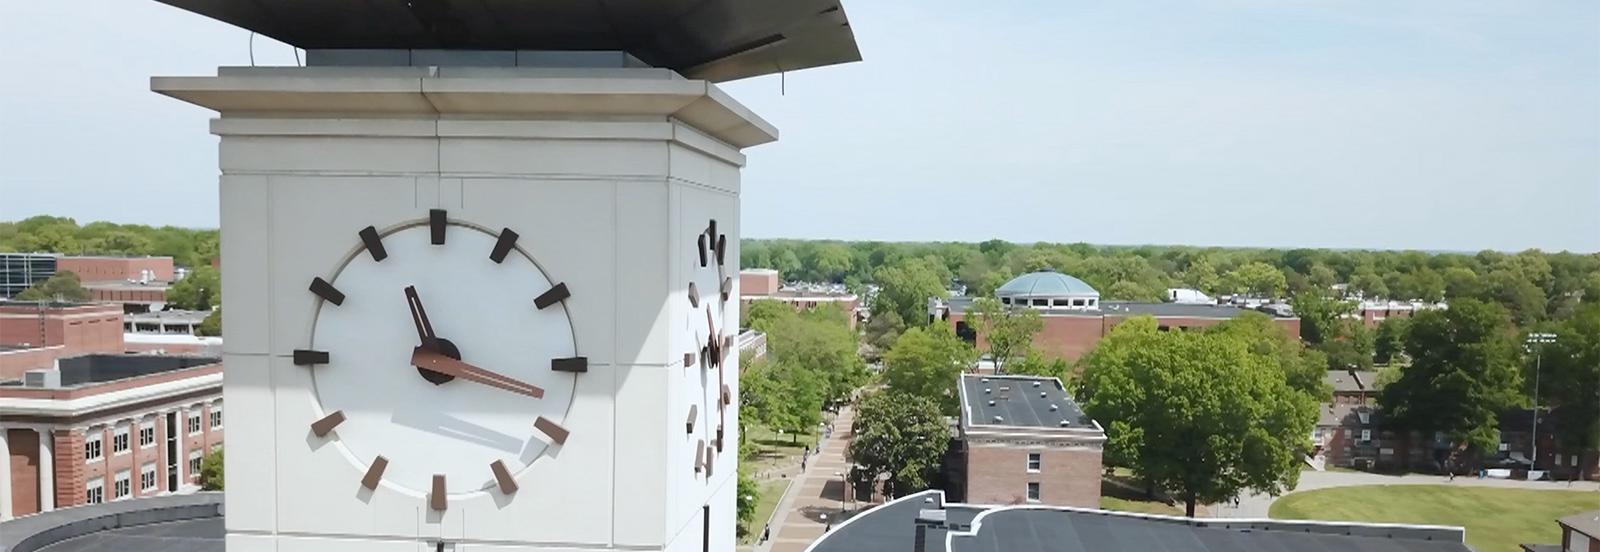 closeup of clocktower